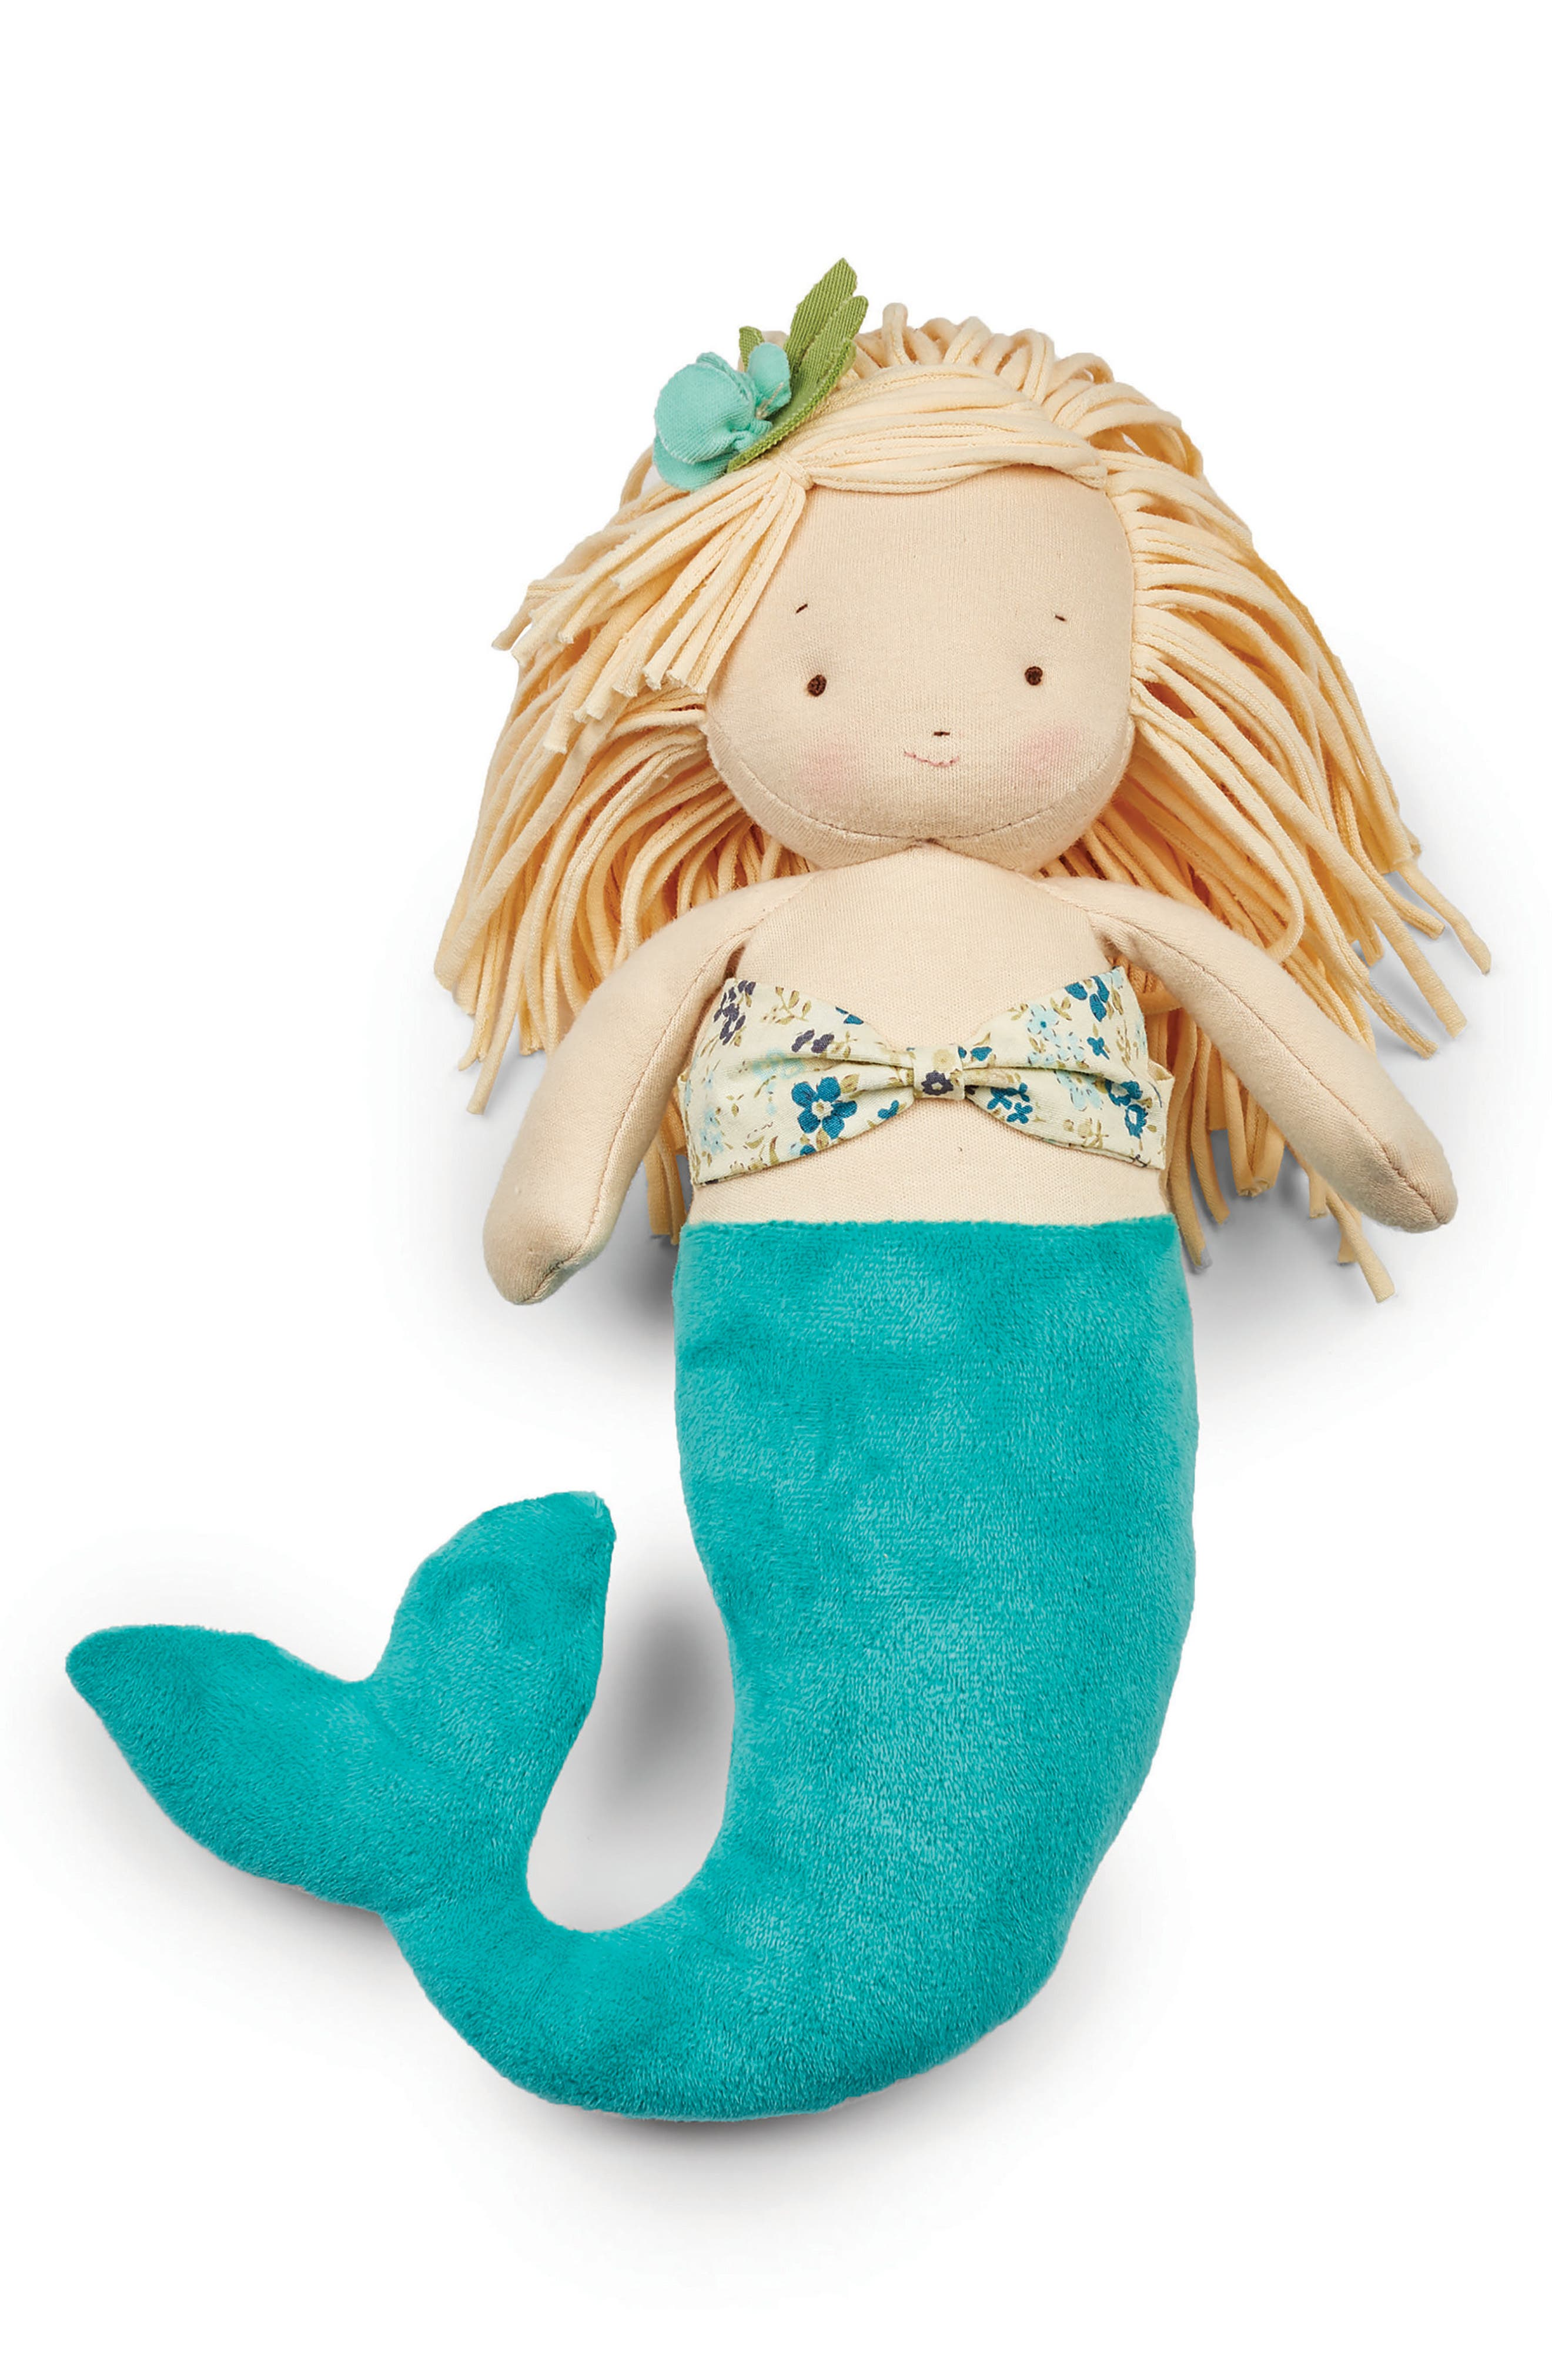 Bunnies by the Bay El-Sea Mermaid Doll